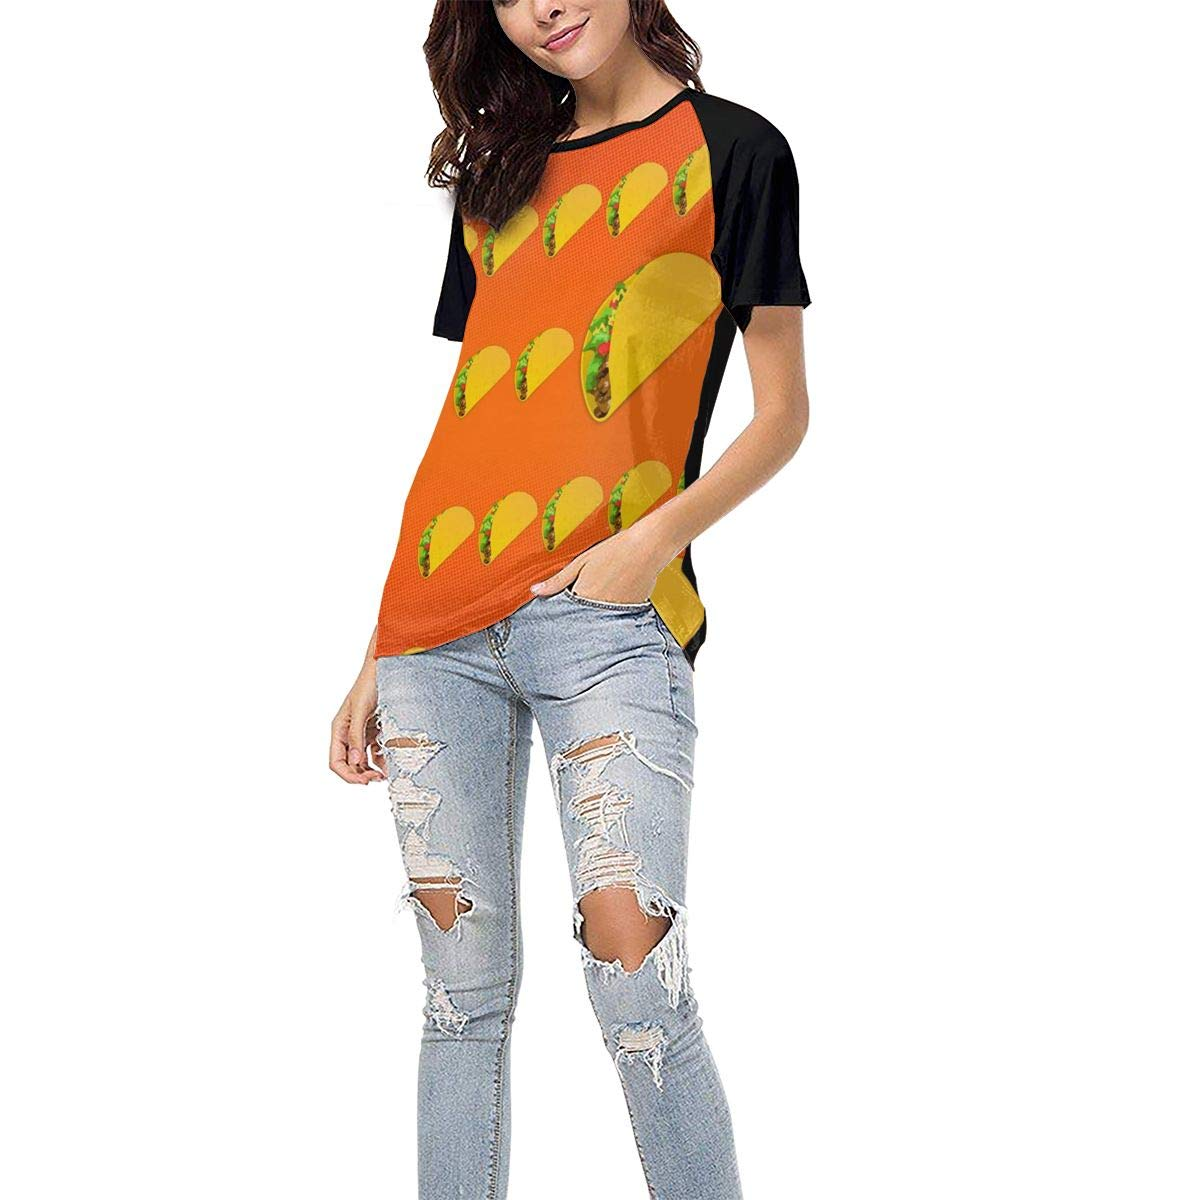 Laki-co Womens Summer Short Sleeve Taco Flying Pattern Casual Raglan Tee Baseball Tshirts Tops Blouse